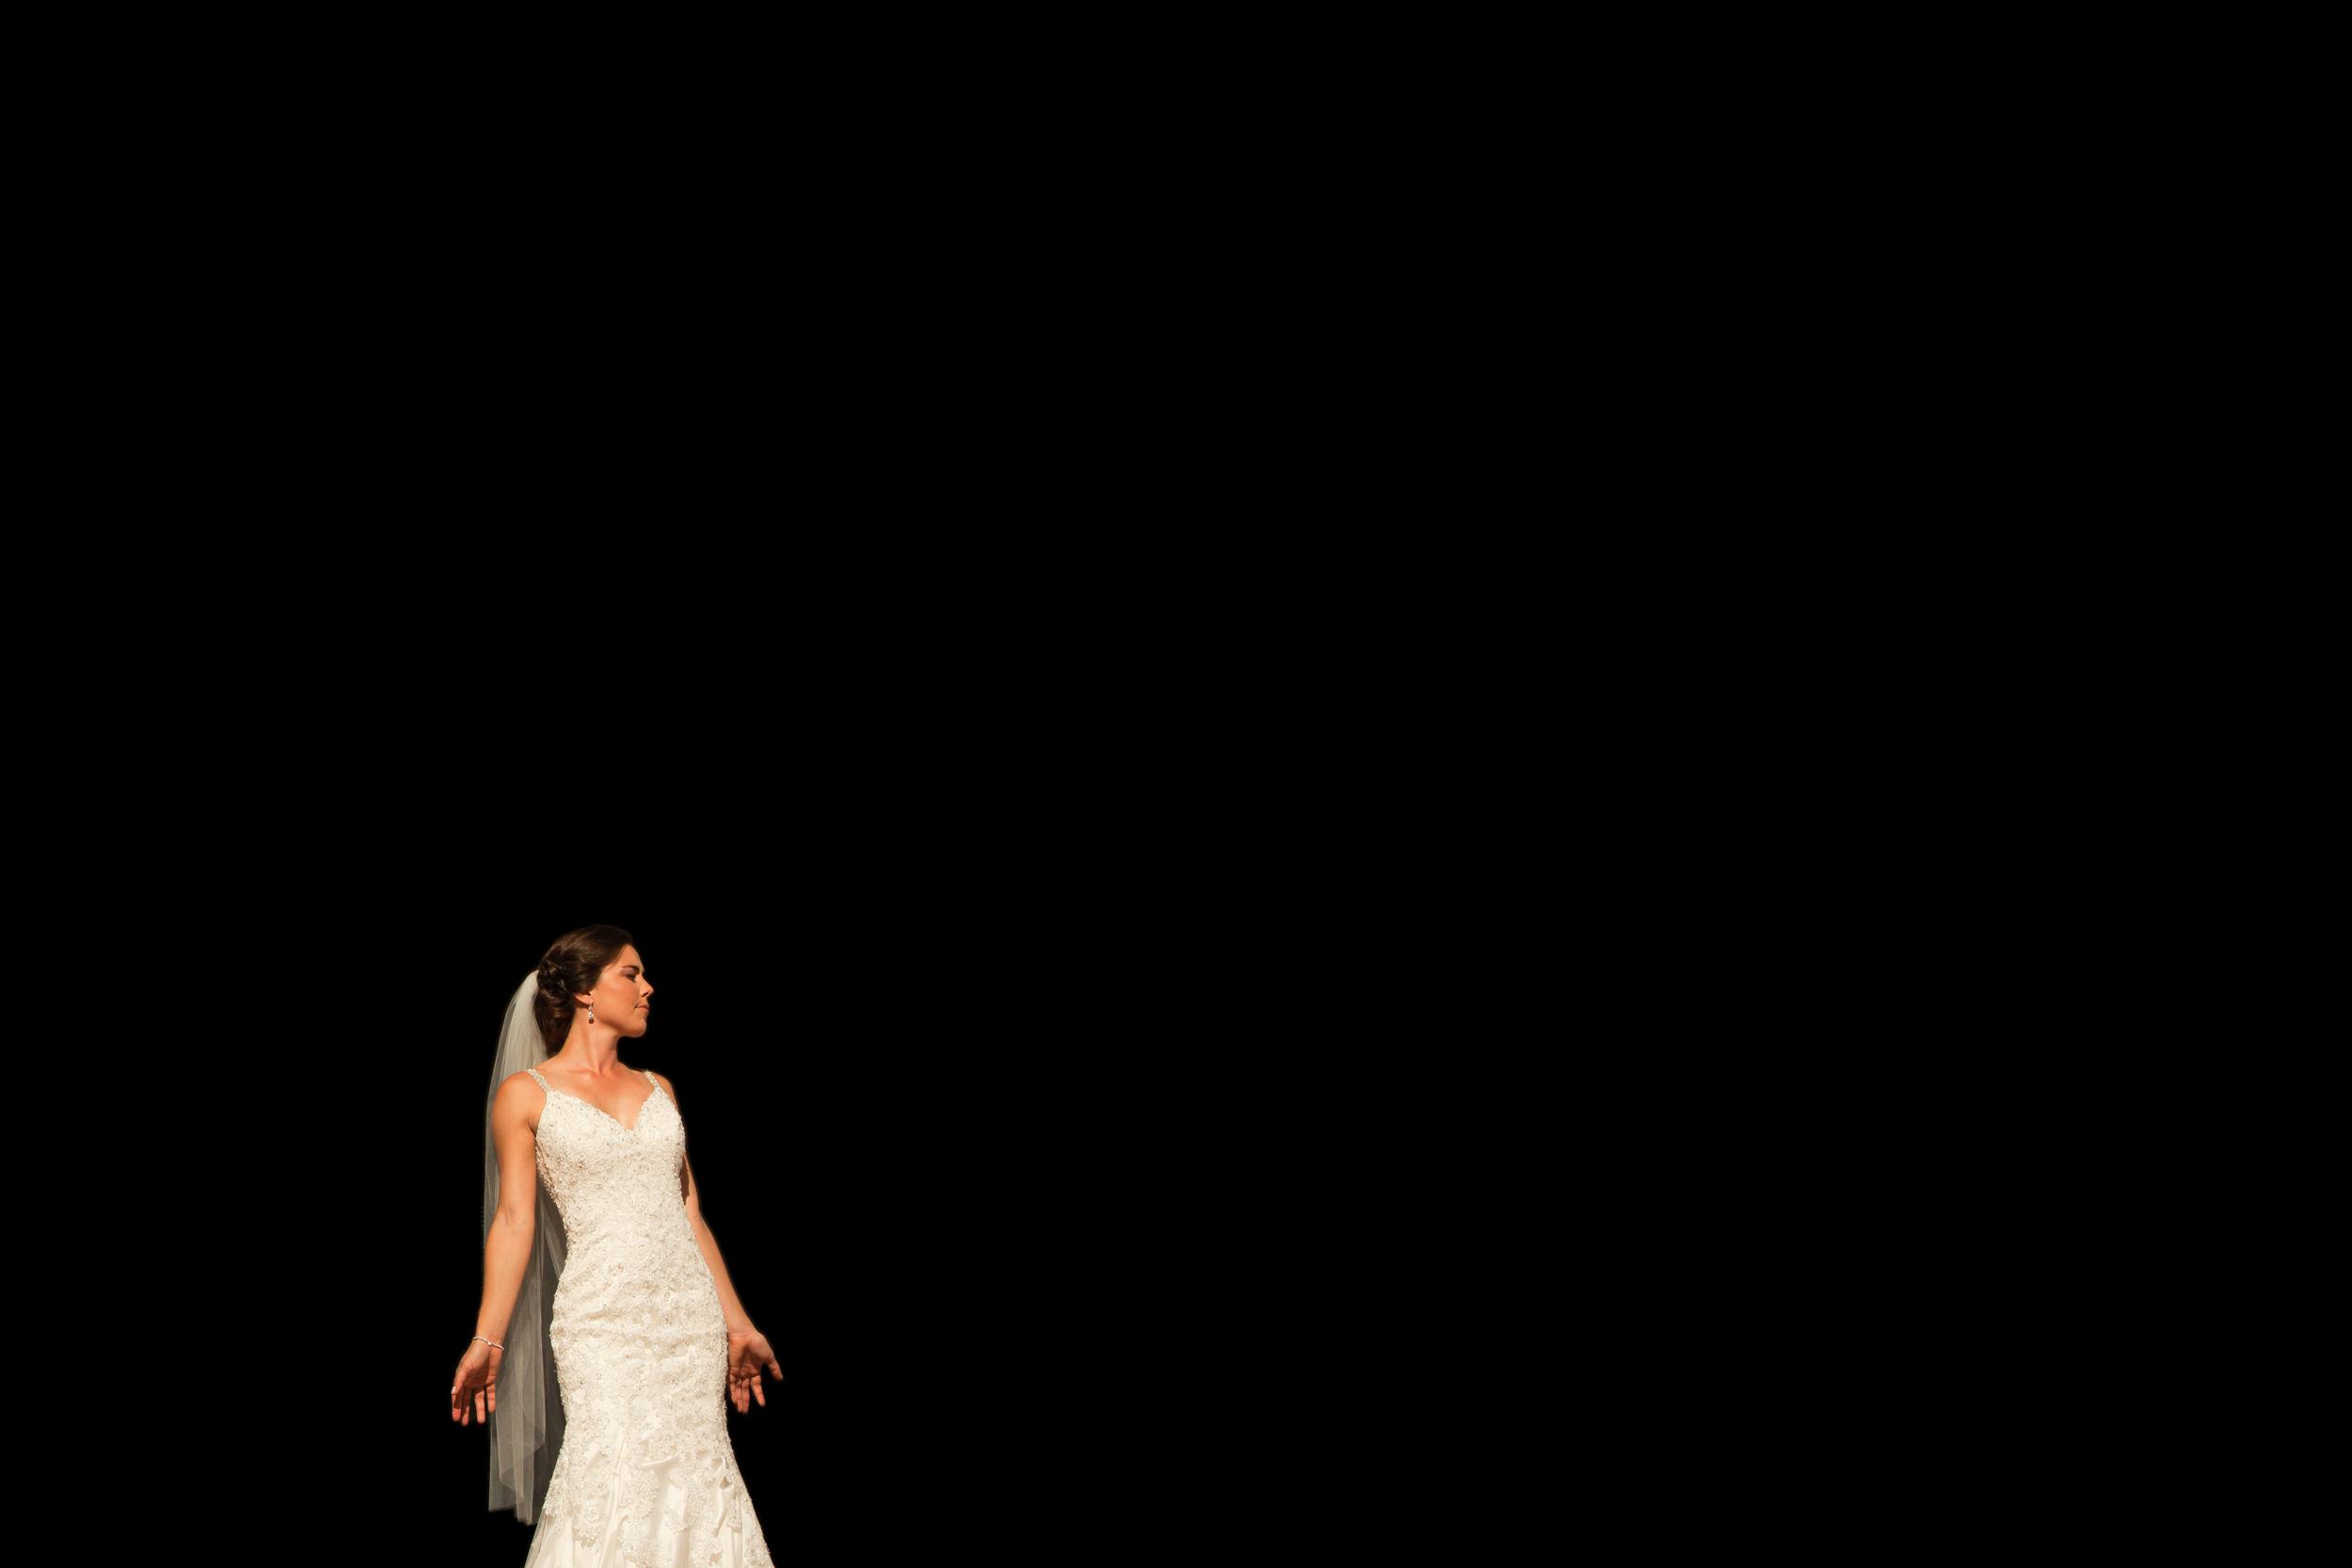 Flordia-Wedding-Photography-36.jpg